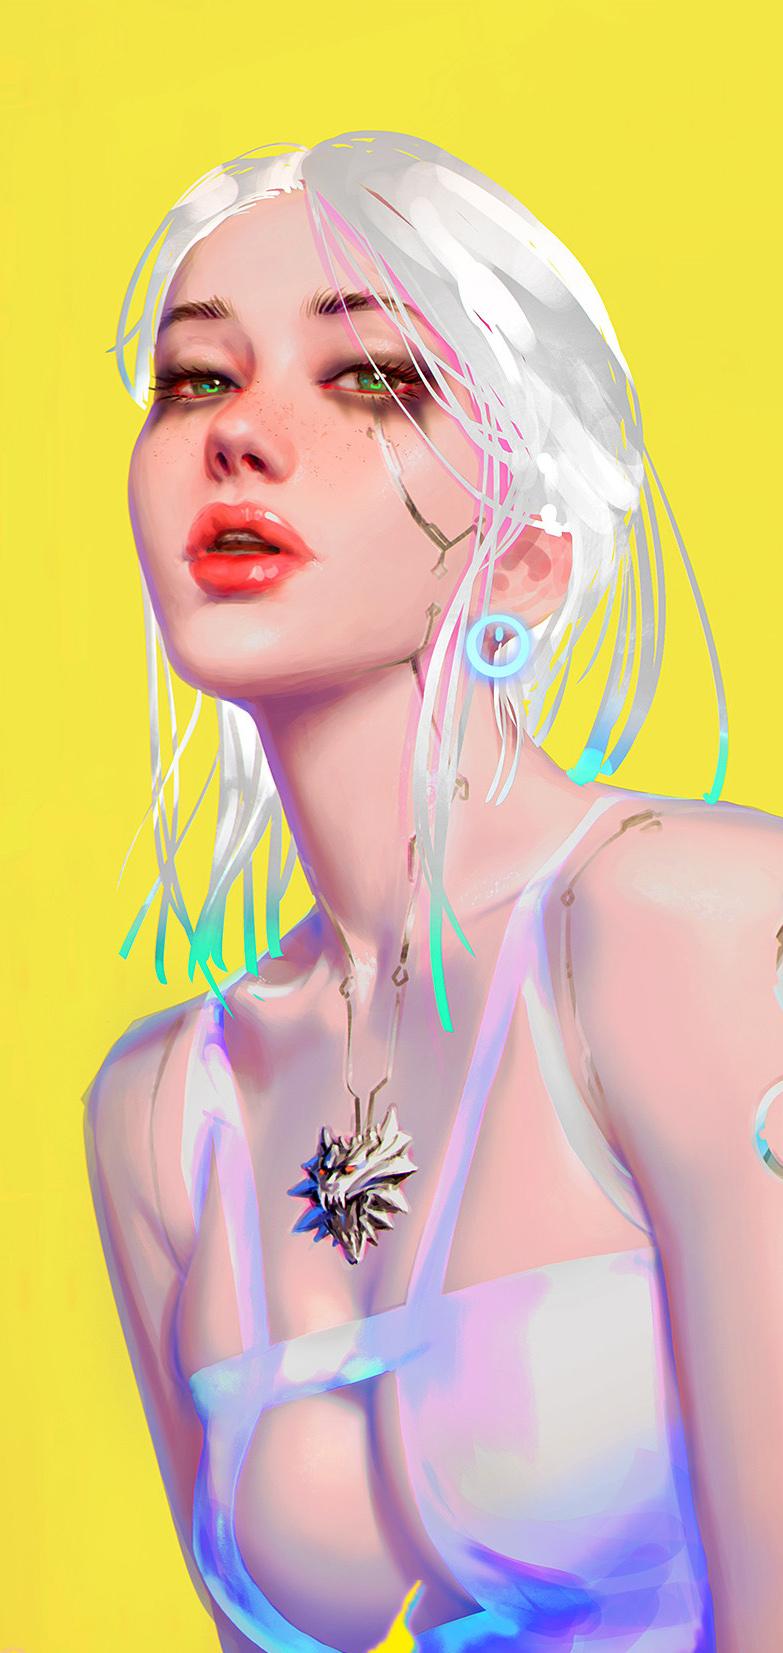 #cyberpunk #art #scifi #vaporwave #digitalart #cyberpunkart #synthwave #retrowave #aesthetic #bladerunner #neon #s #cyber #d #anime #futuristic #cyberpunkaesthetic #sciencefiction #scifiart #future #retro #vaporwaveaesthetic #illustration #manga #cyberpunkstyle #cybergoth #photography #cyberpunkcity #conceptart #bhfyp